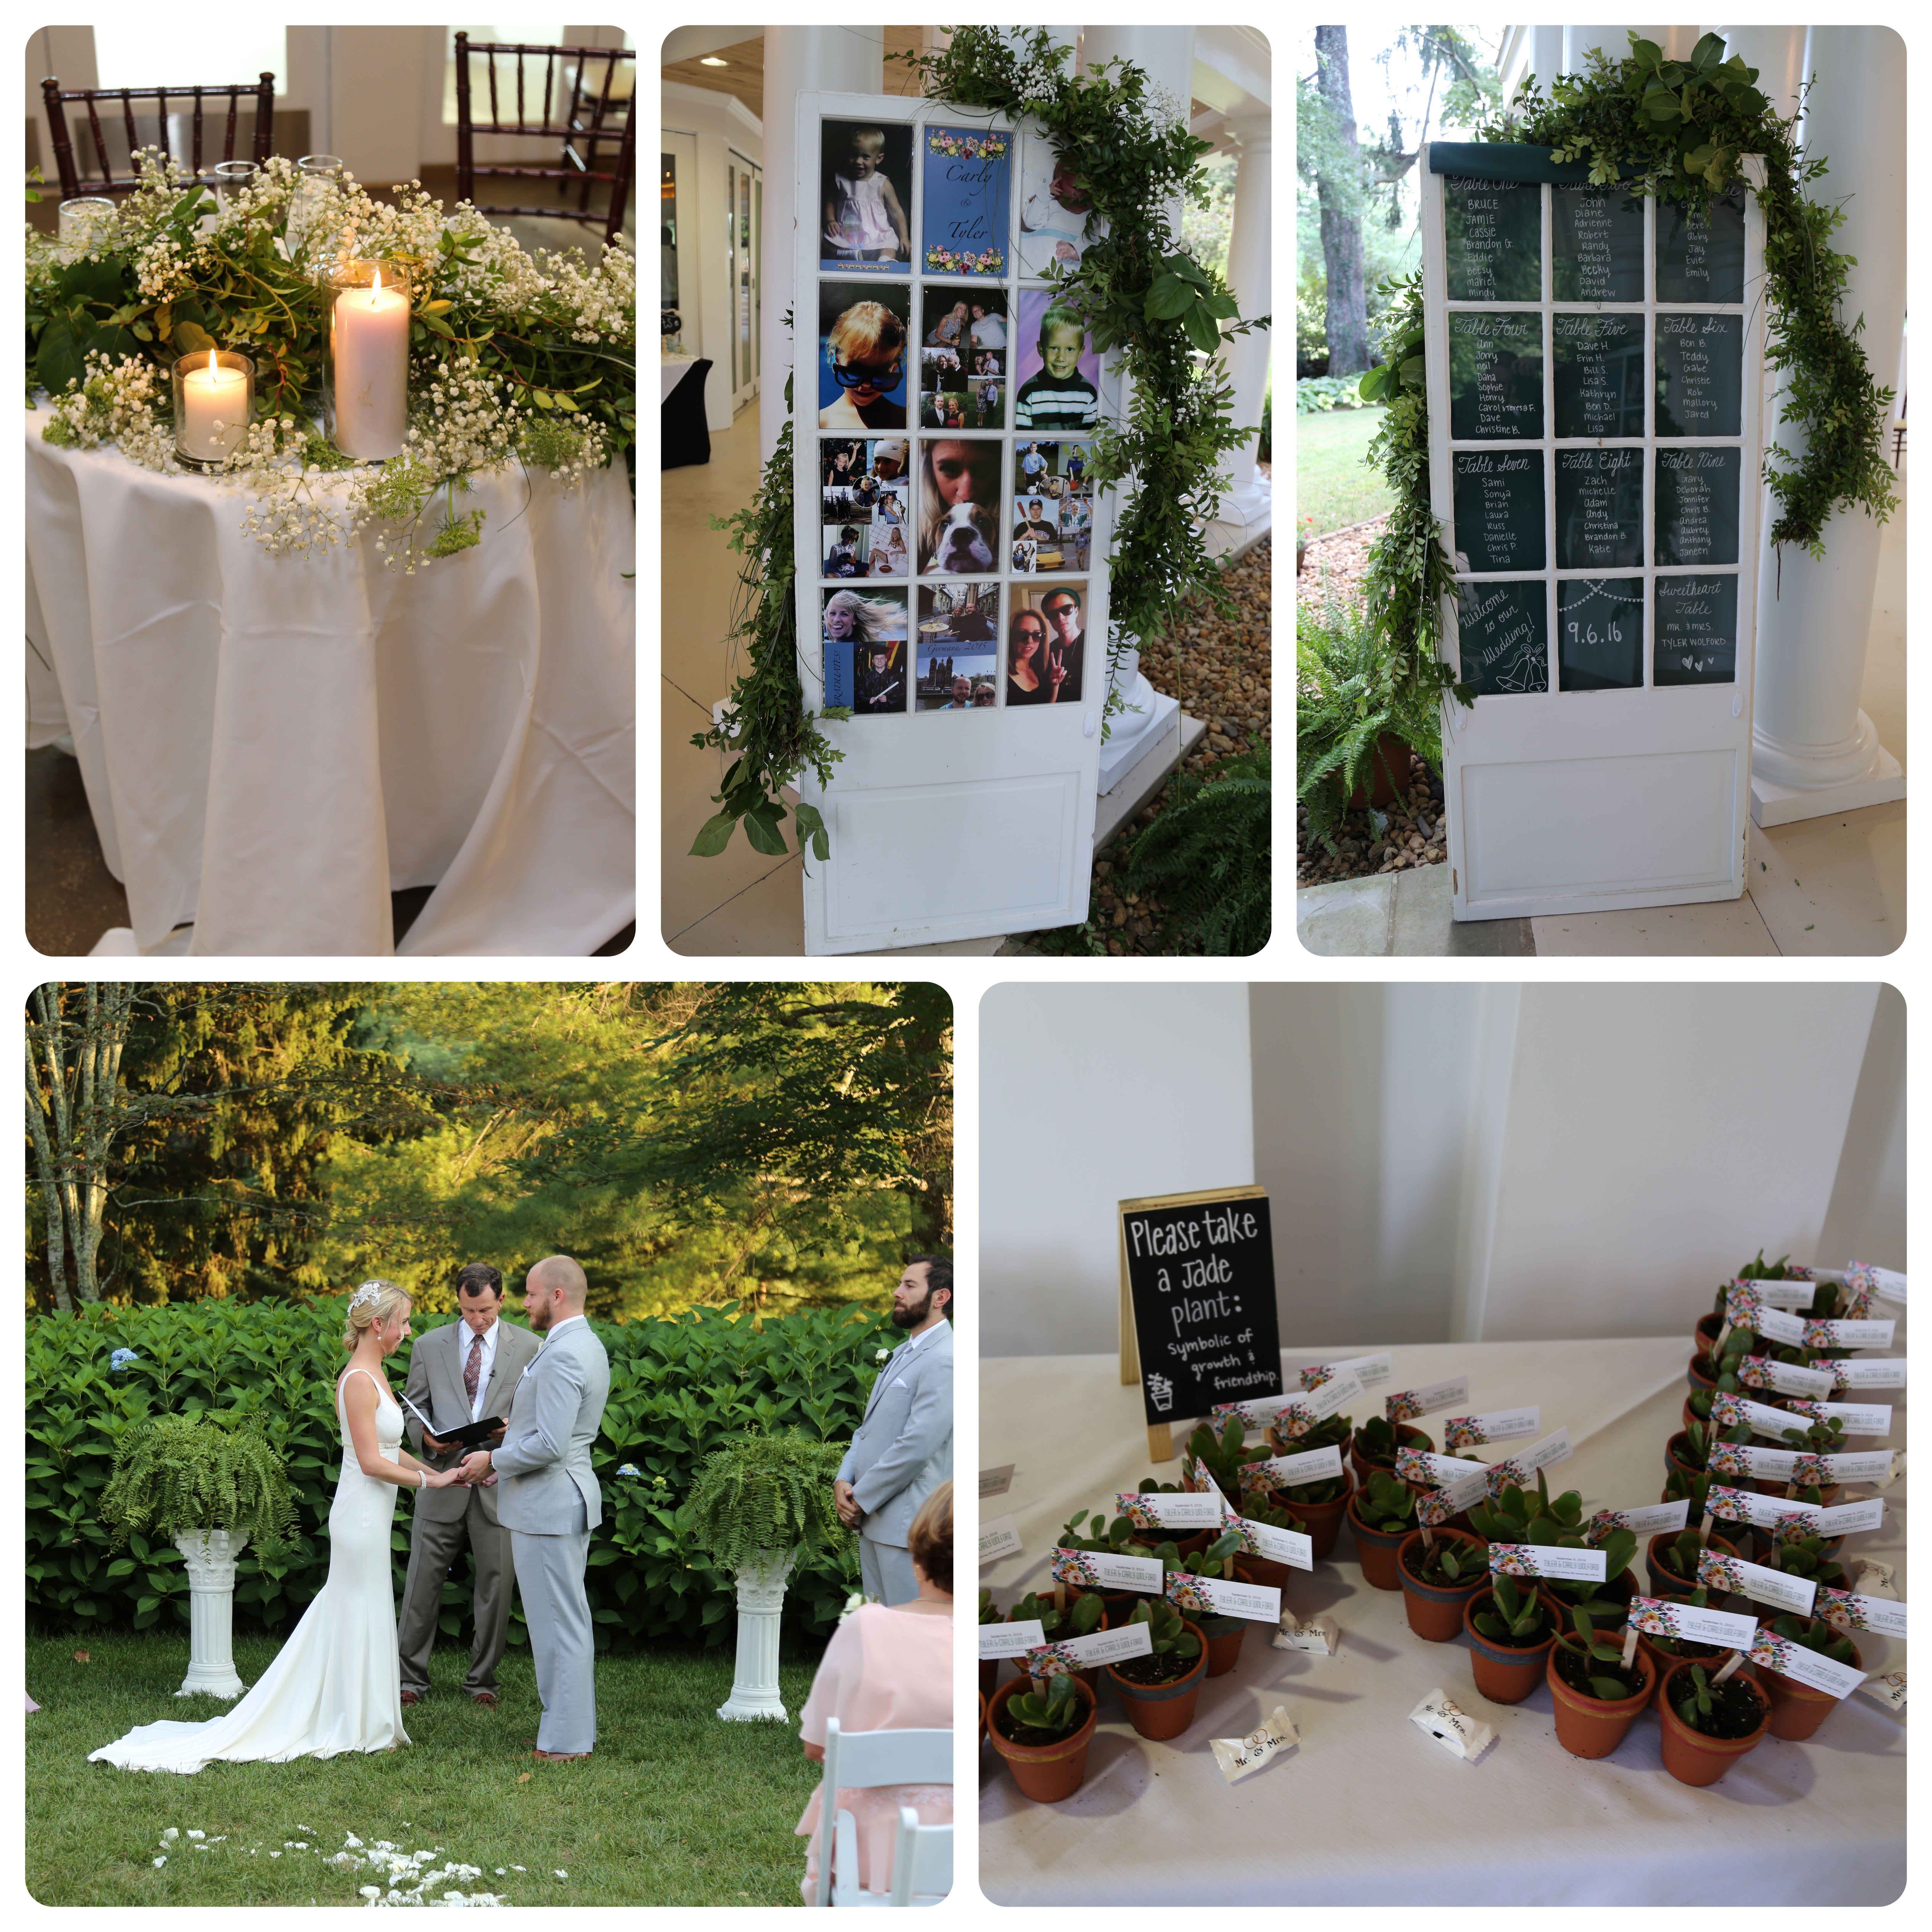 Wedding Dj Photo Booth Lighting In Ventura County Santa Barbara